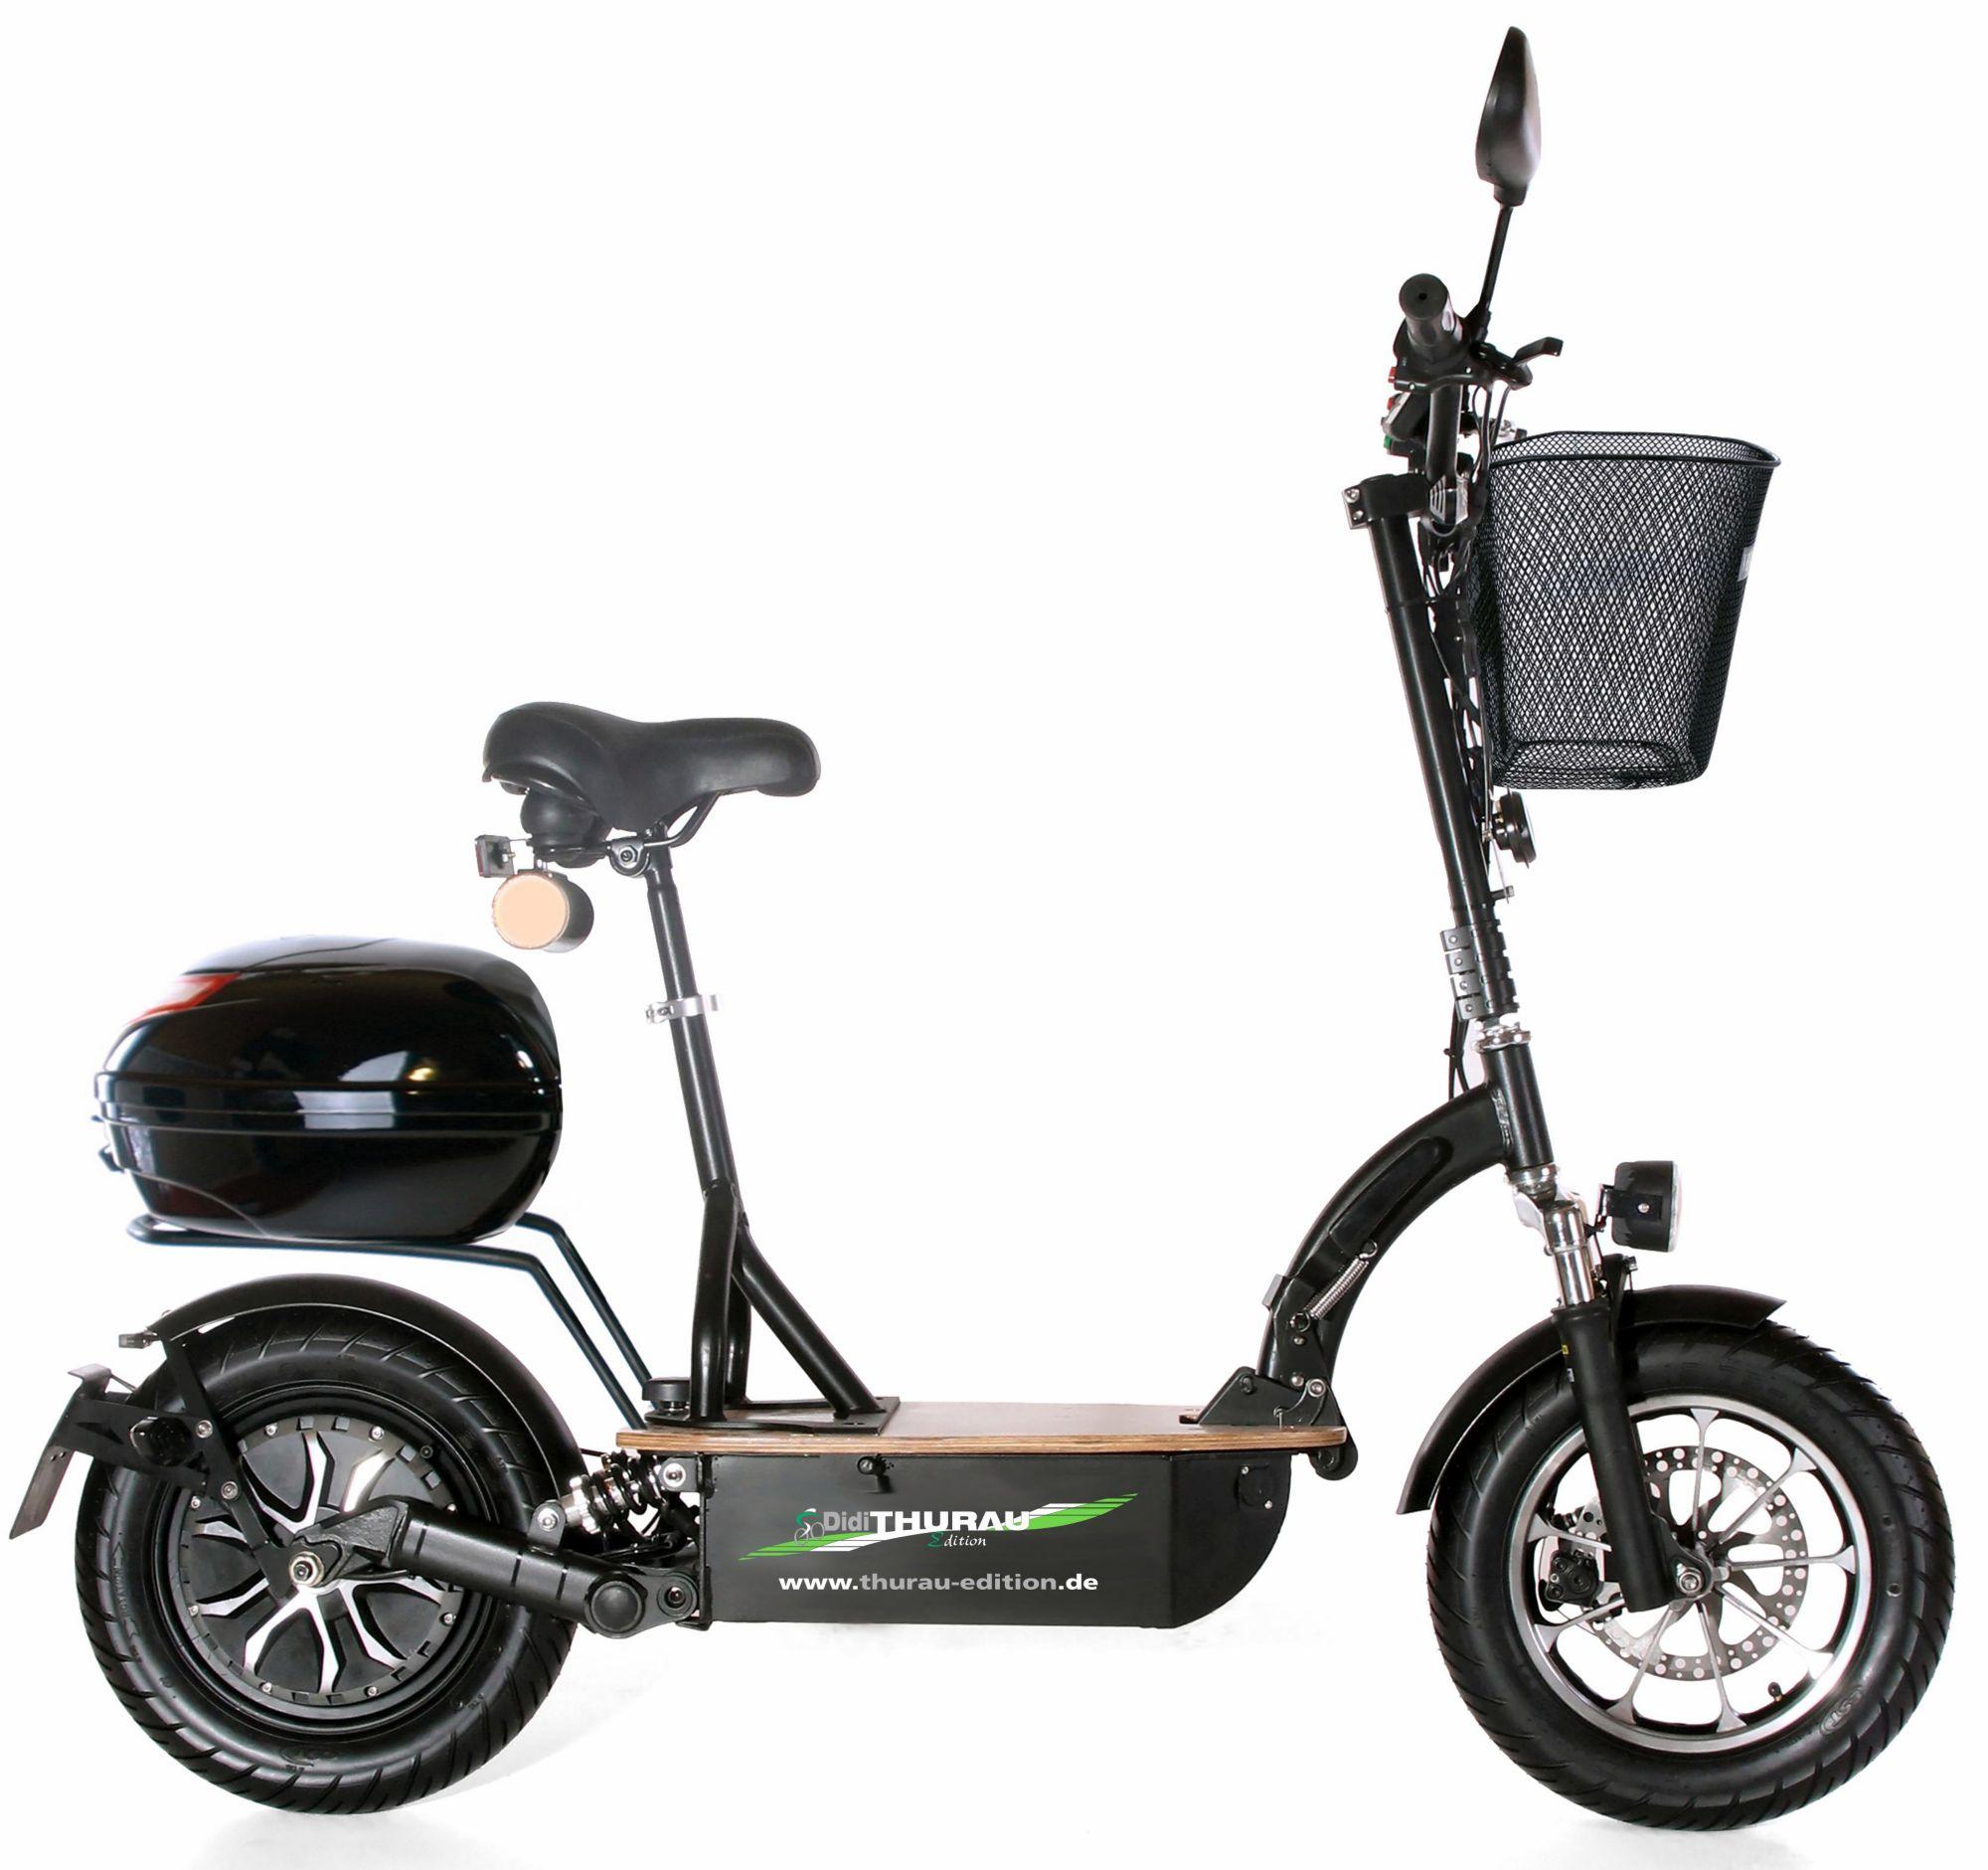 DIDI THURAU EDITION Didi Thurau Edition Elektro-Roller Eco-Tourer Speed, 45 km/h, »Safety Plus«